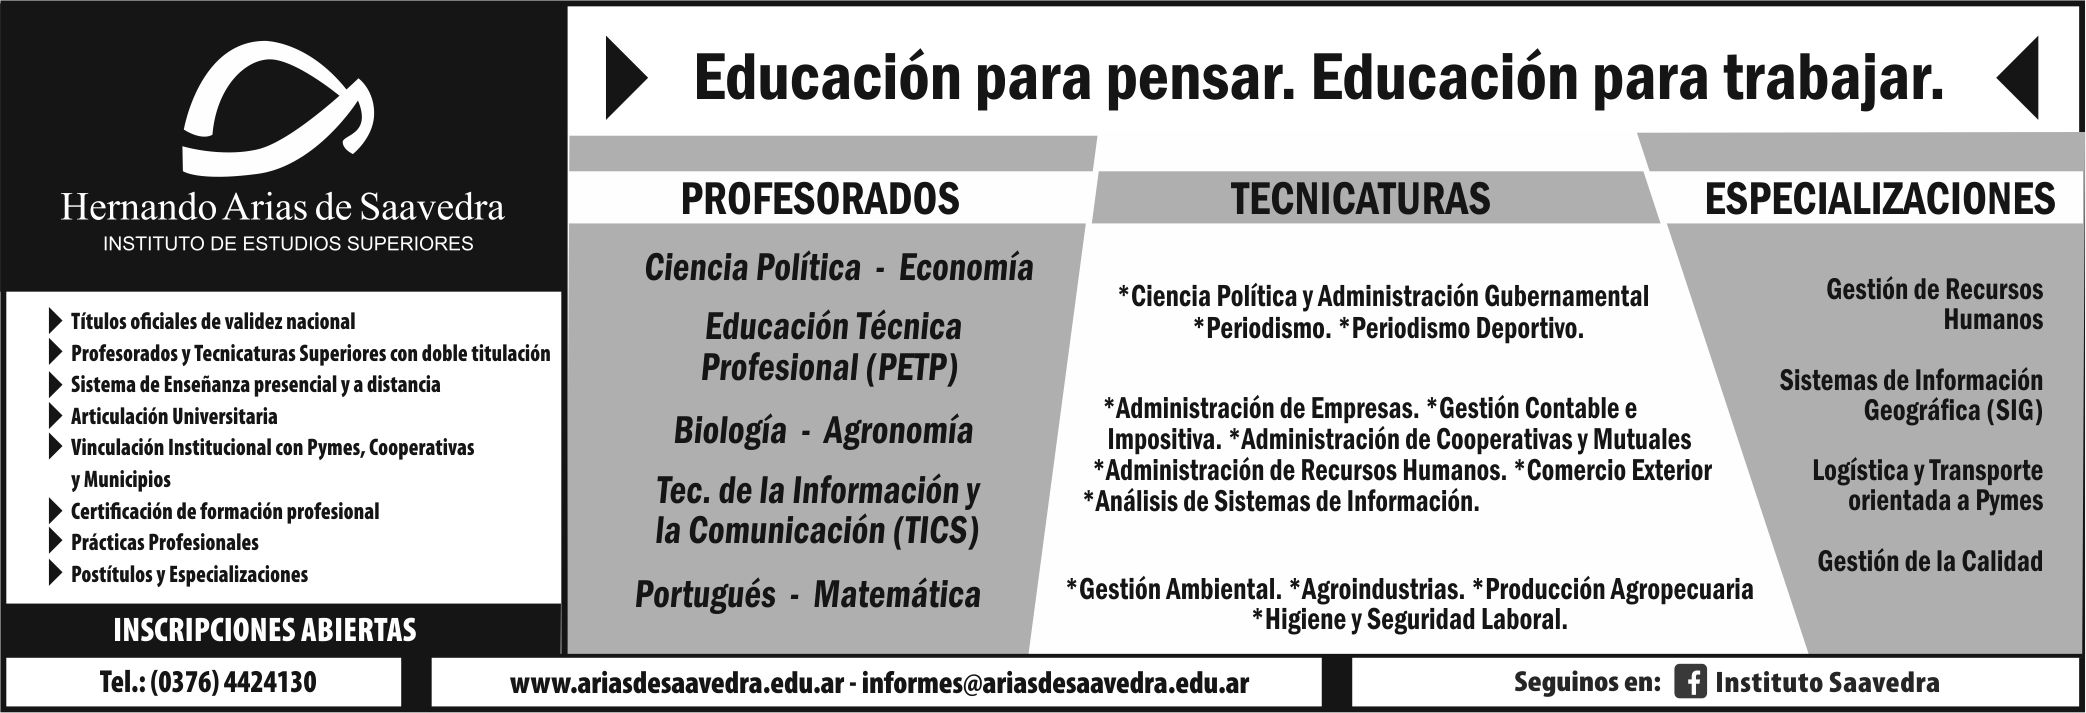 INSTITUTO DE ESTUDIOS SUPERIORES HERNANDO ARIAS DE SAAVEDRA